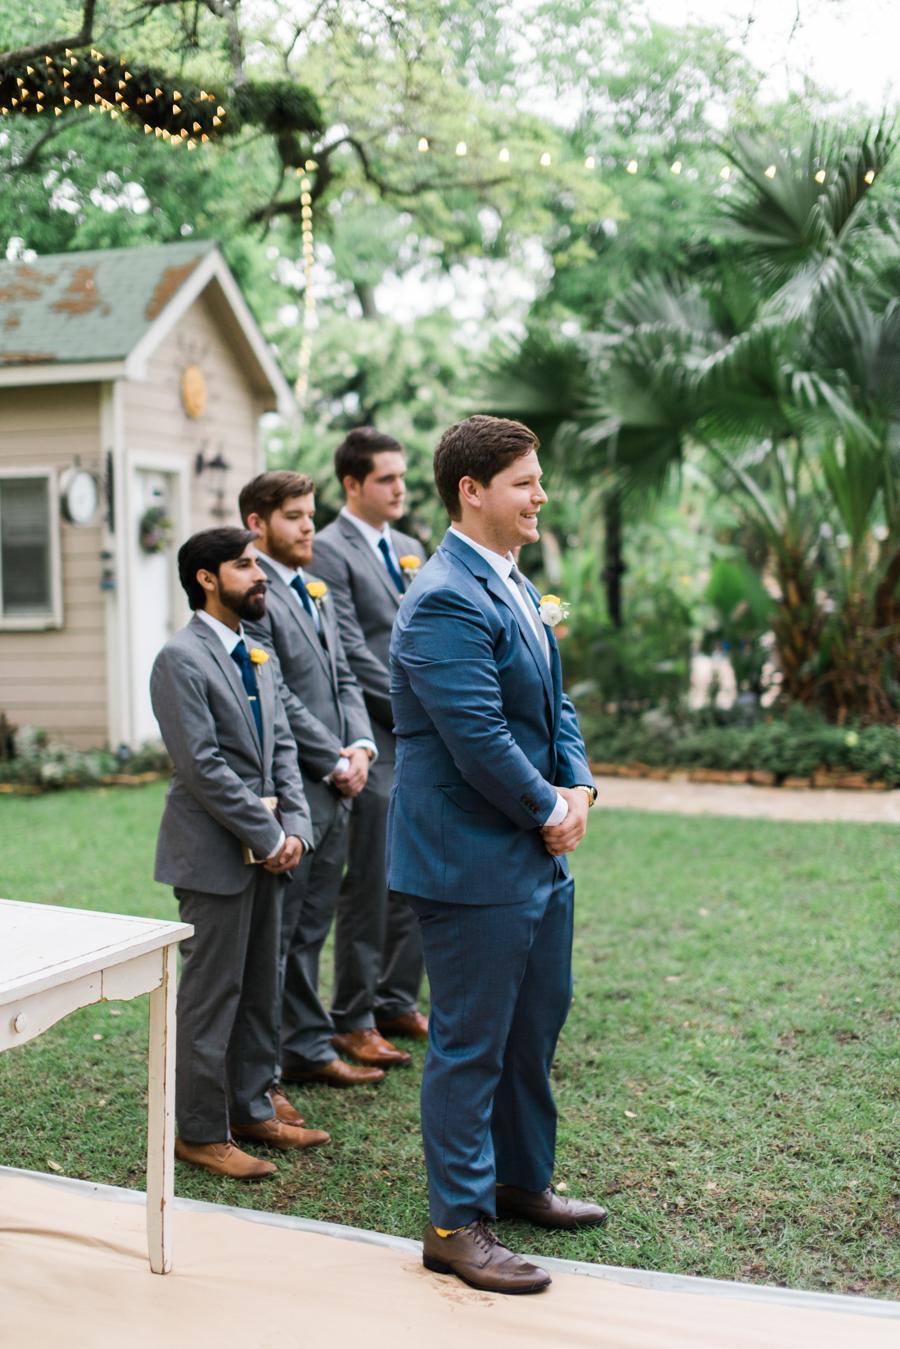 Dana Fernandez Photography Houston Texas Destination Photographer Film Ruffled Blog Wedding Bridal First Look Featured Photography -14.jpg